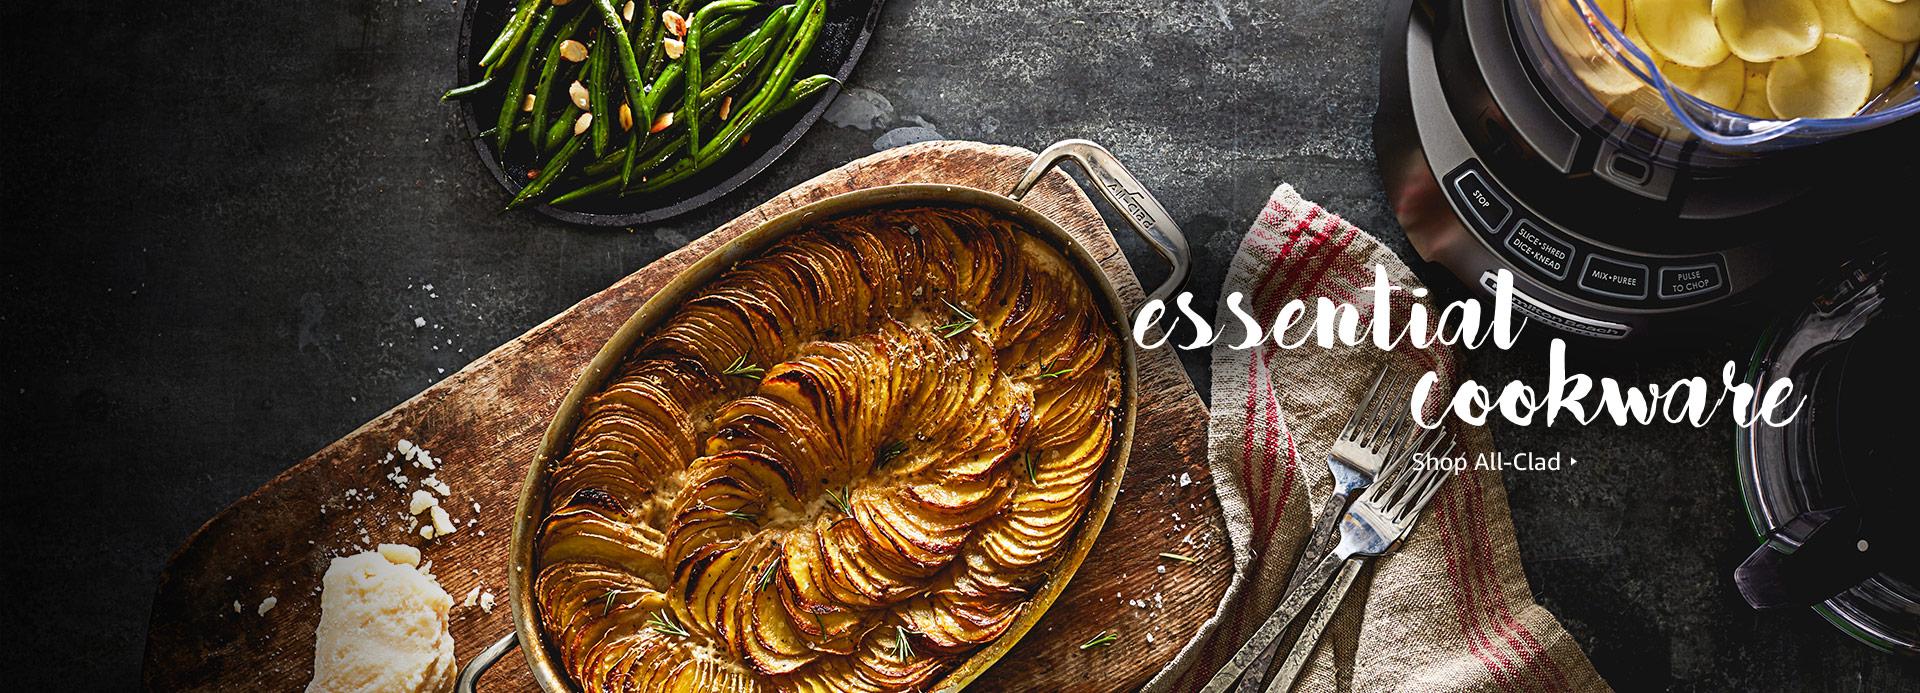 Cooking, Creuset